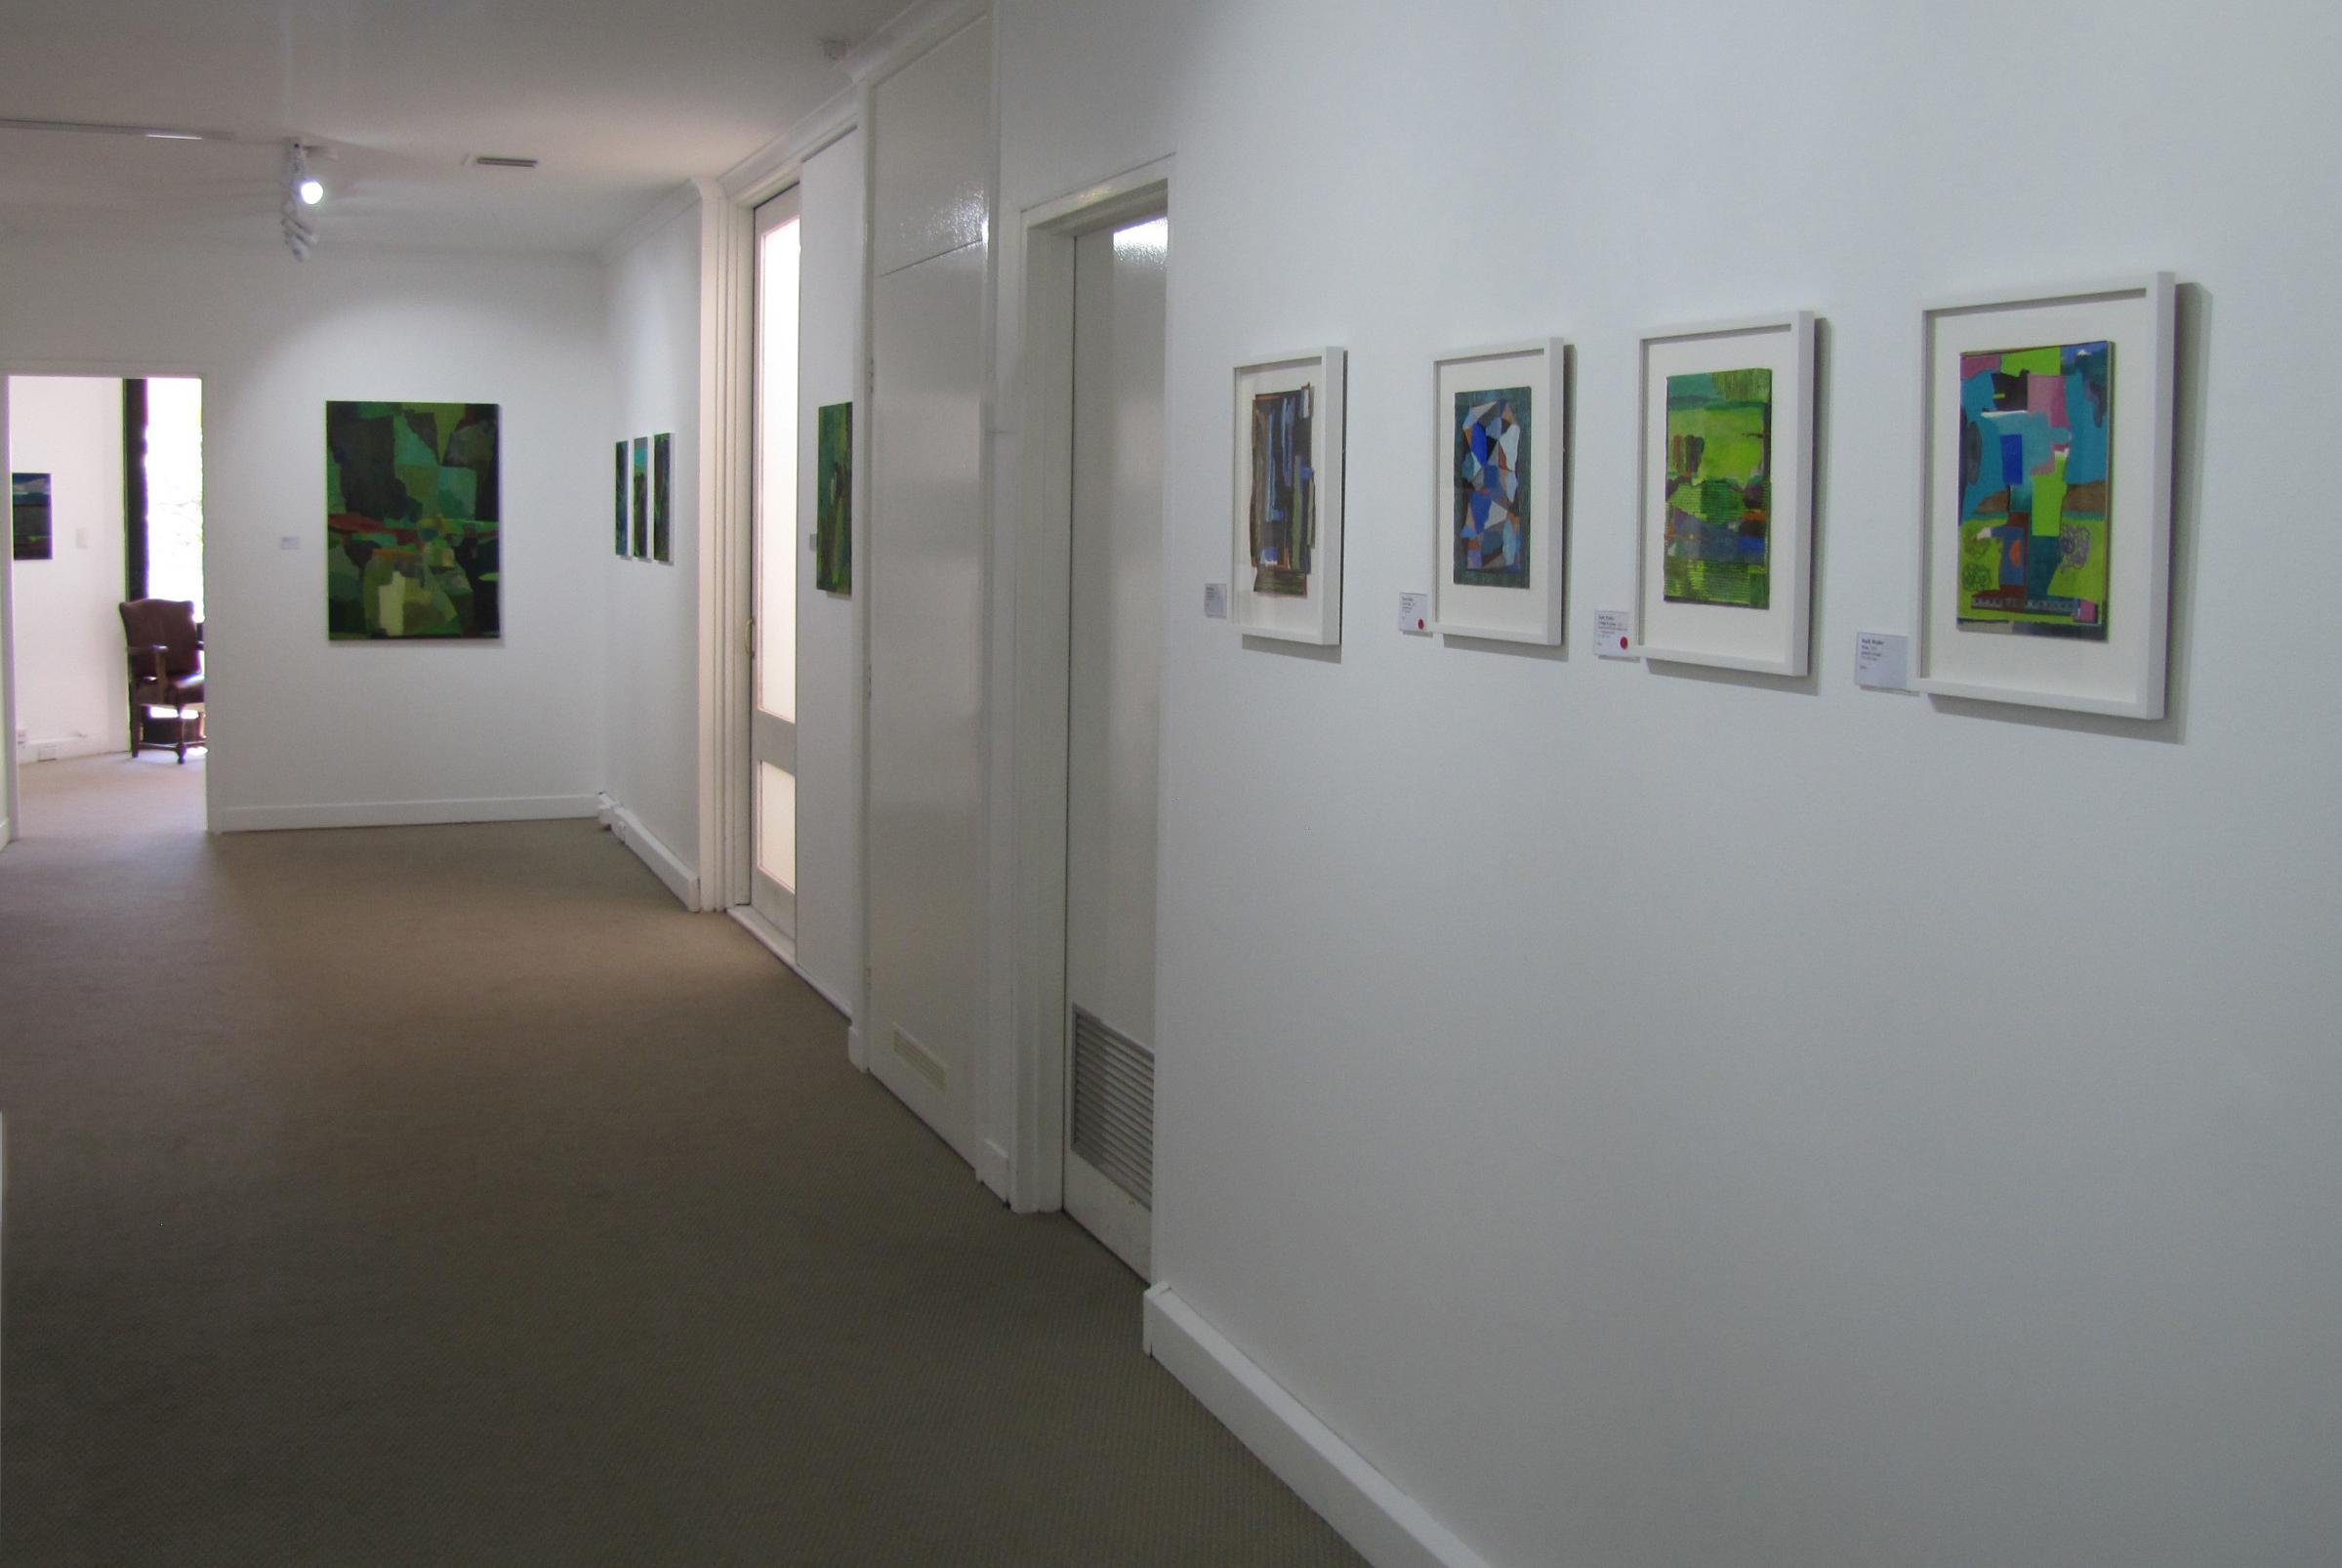 NSG. Waller 2 exhibition. Exhibition views 8.jpg